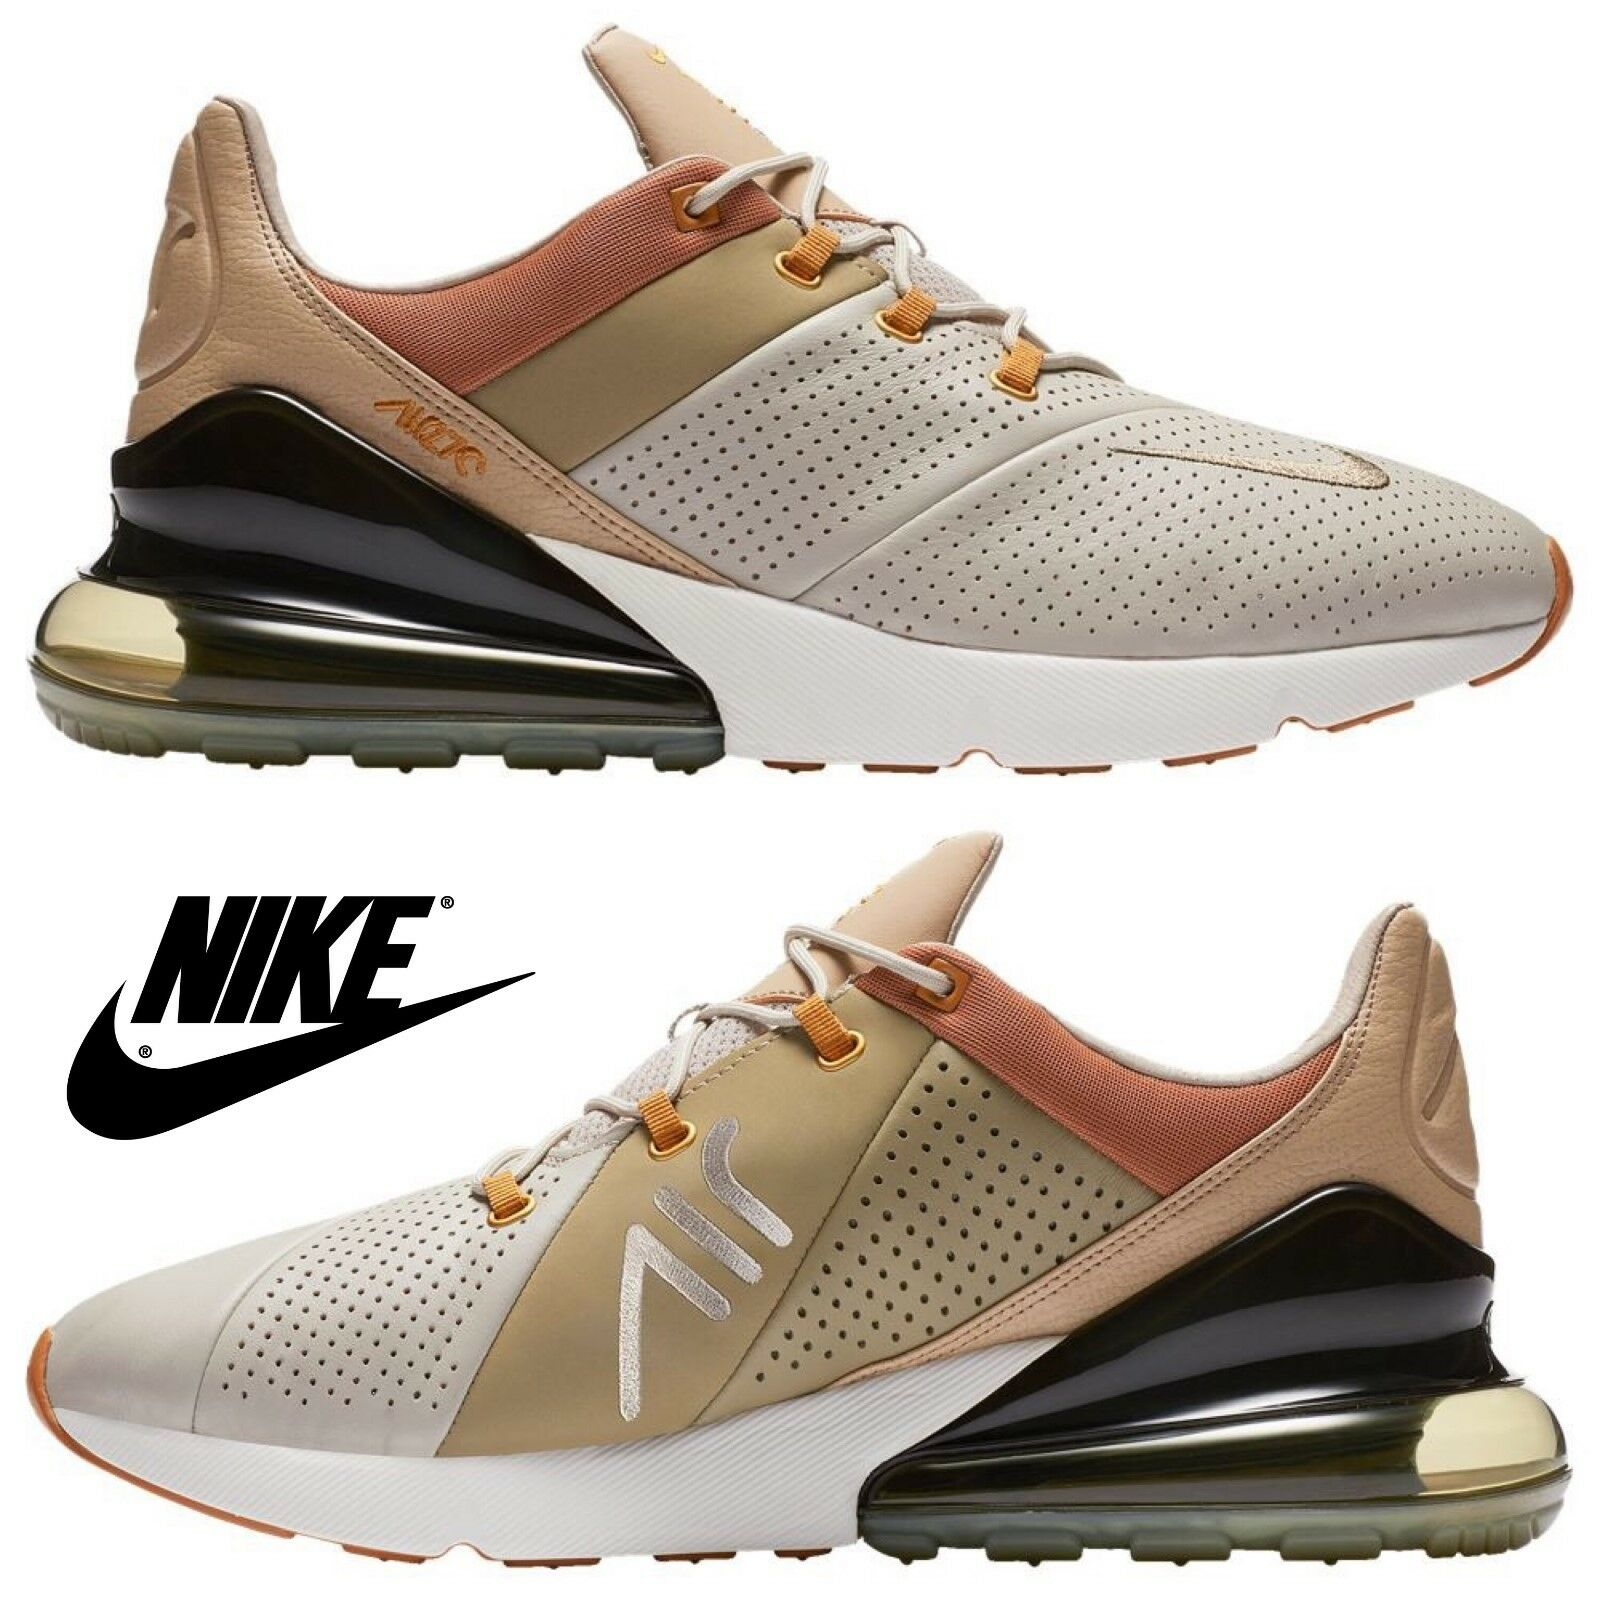 Nike Air Max 270 Premium scarpe da ginnastica Men's Running Athletic Comfort Gym Casual NIB